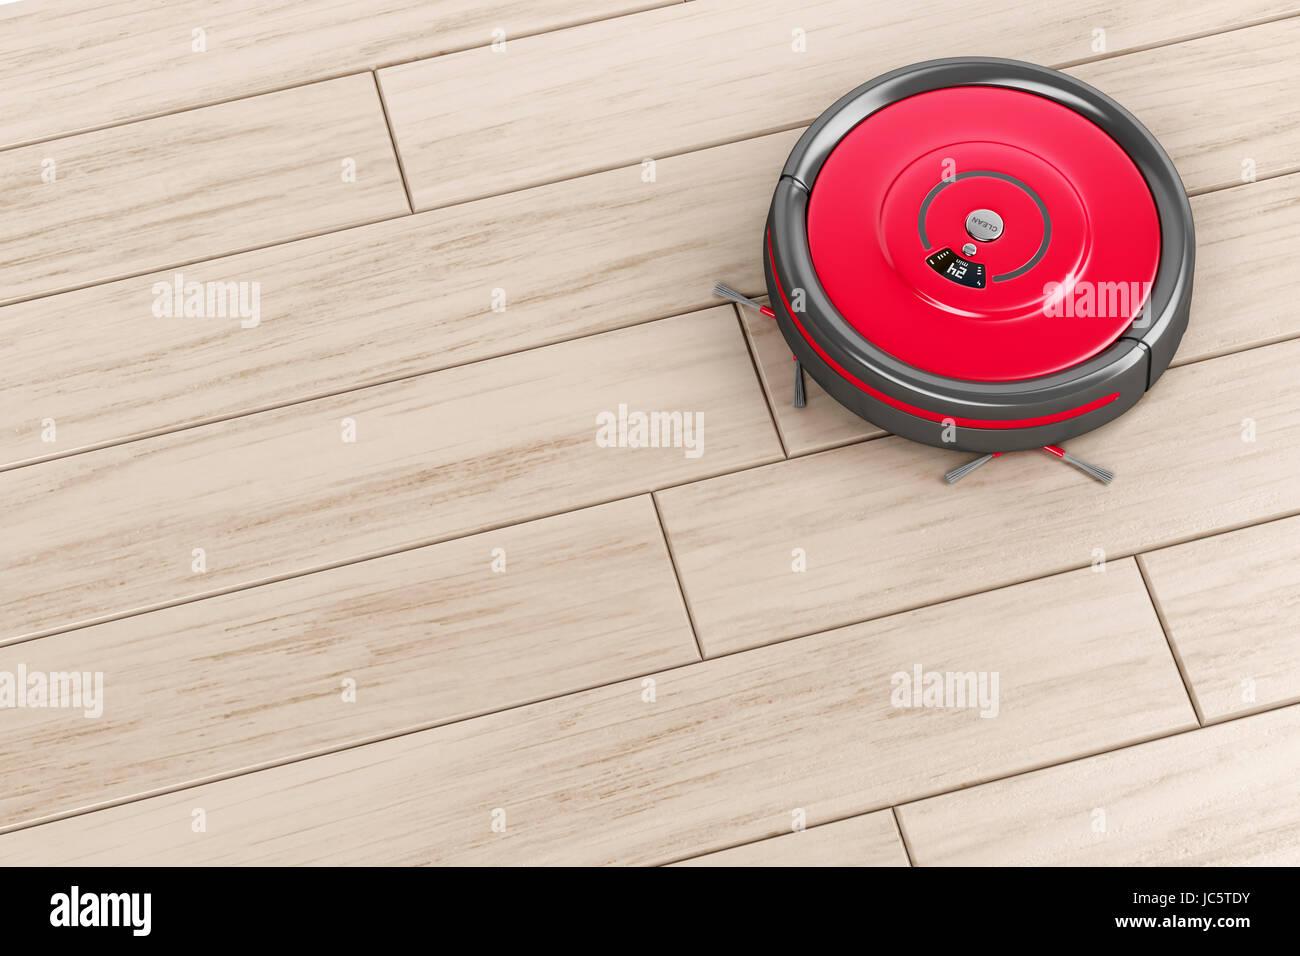 Fußboden Roboter ~ Roboter staubsauger auf dem boden stockfoto bild alamy